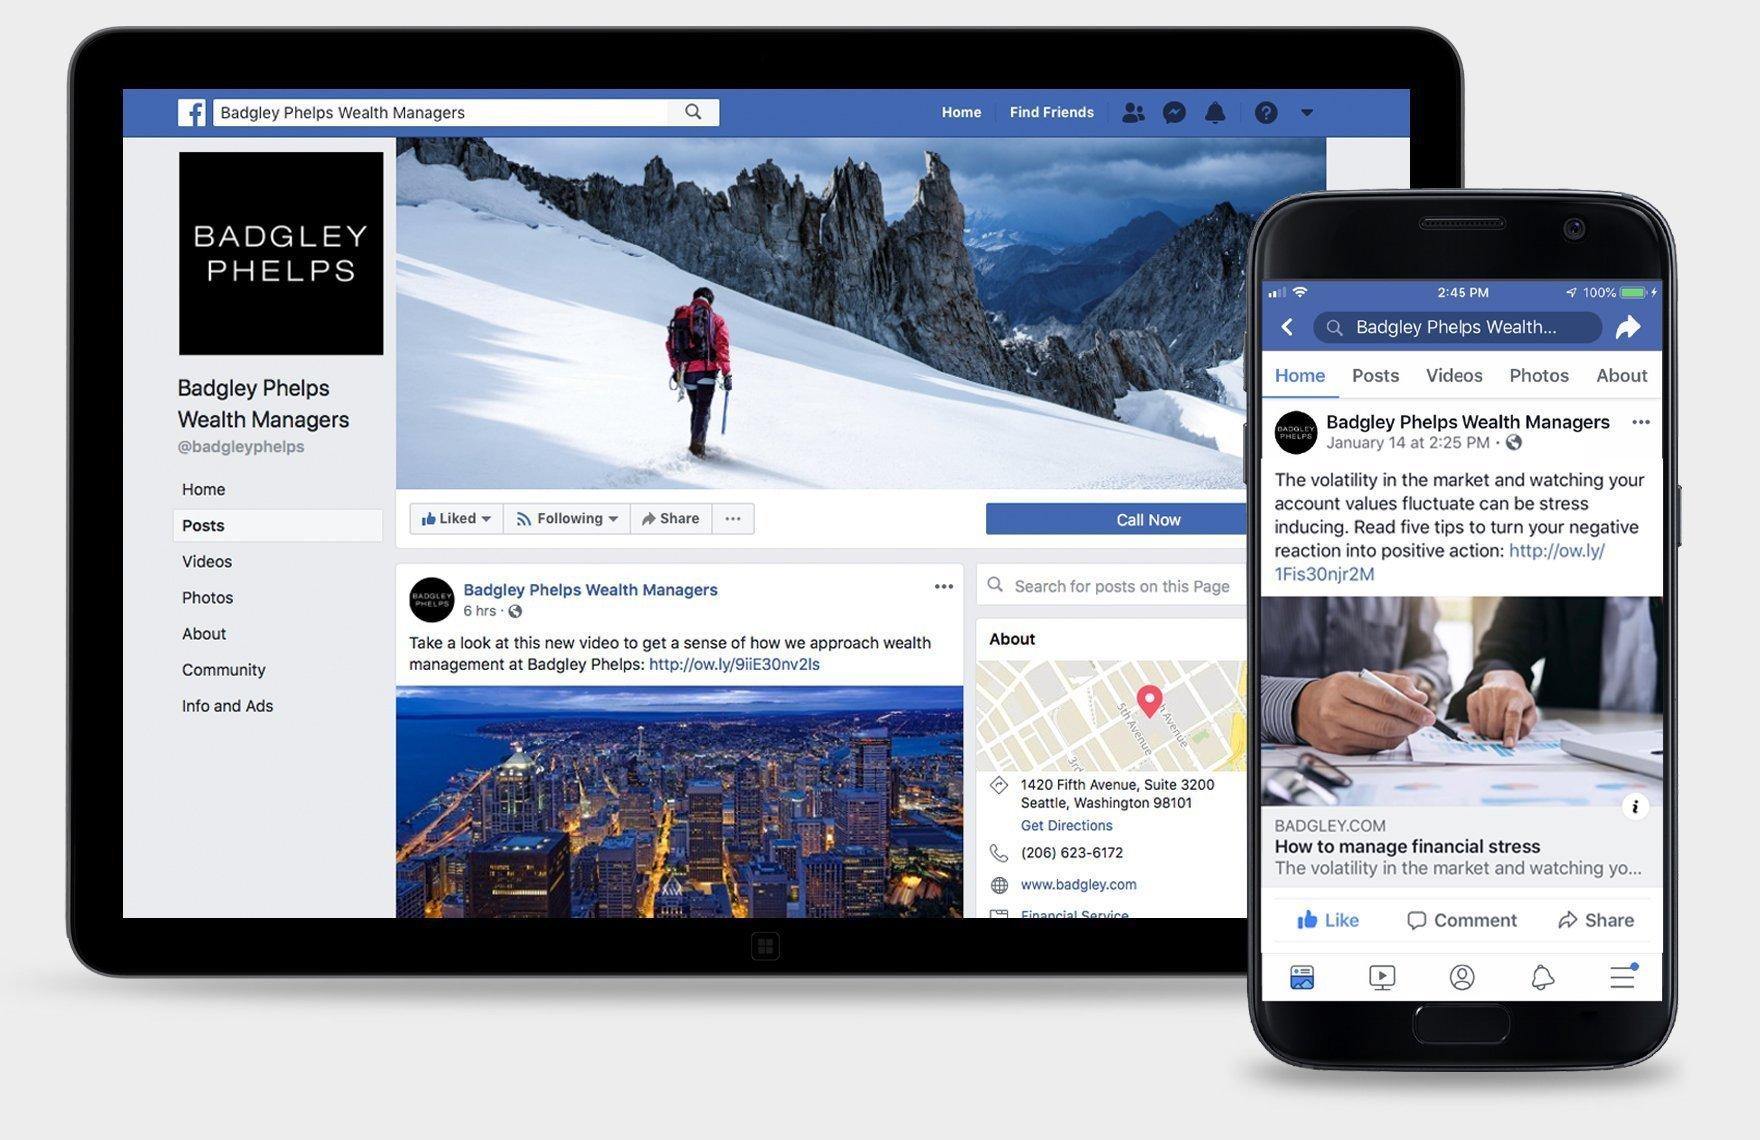 Badgley Phelps Facebook social media strategy and design.